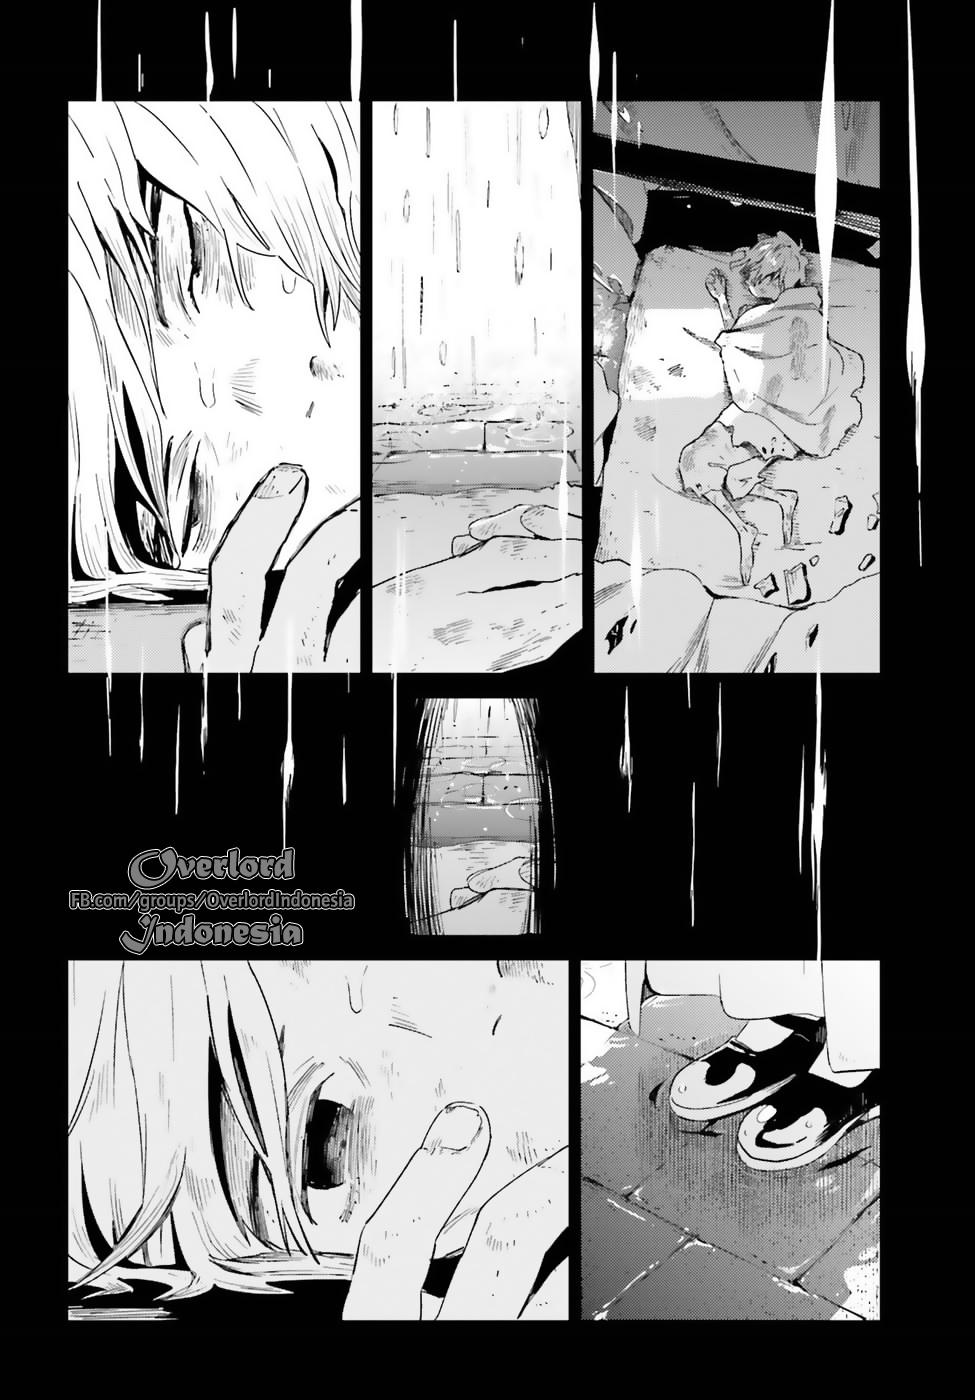 Baca Manga Overlord chapter 28 Bahasa Indonesia